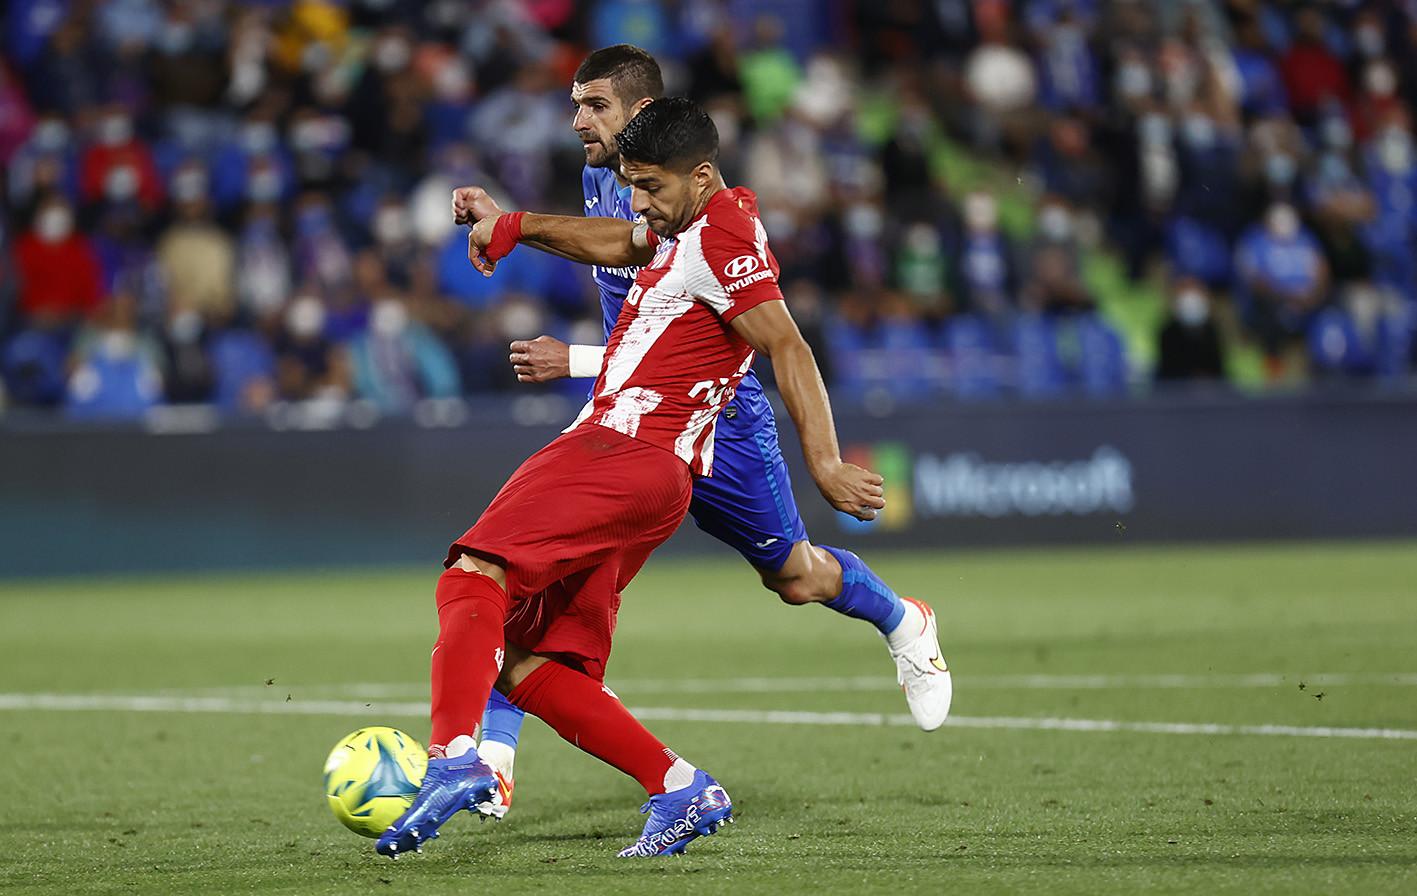 Getafe vs Atletico Madrid: Luis Suarez Moncer, Los Rojiblancos Spesialis Menit Akhir - JPNN.com